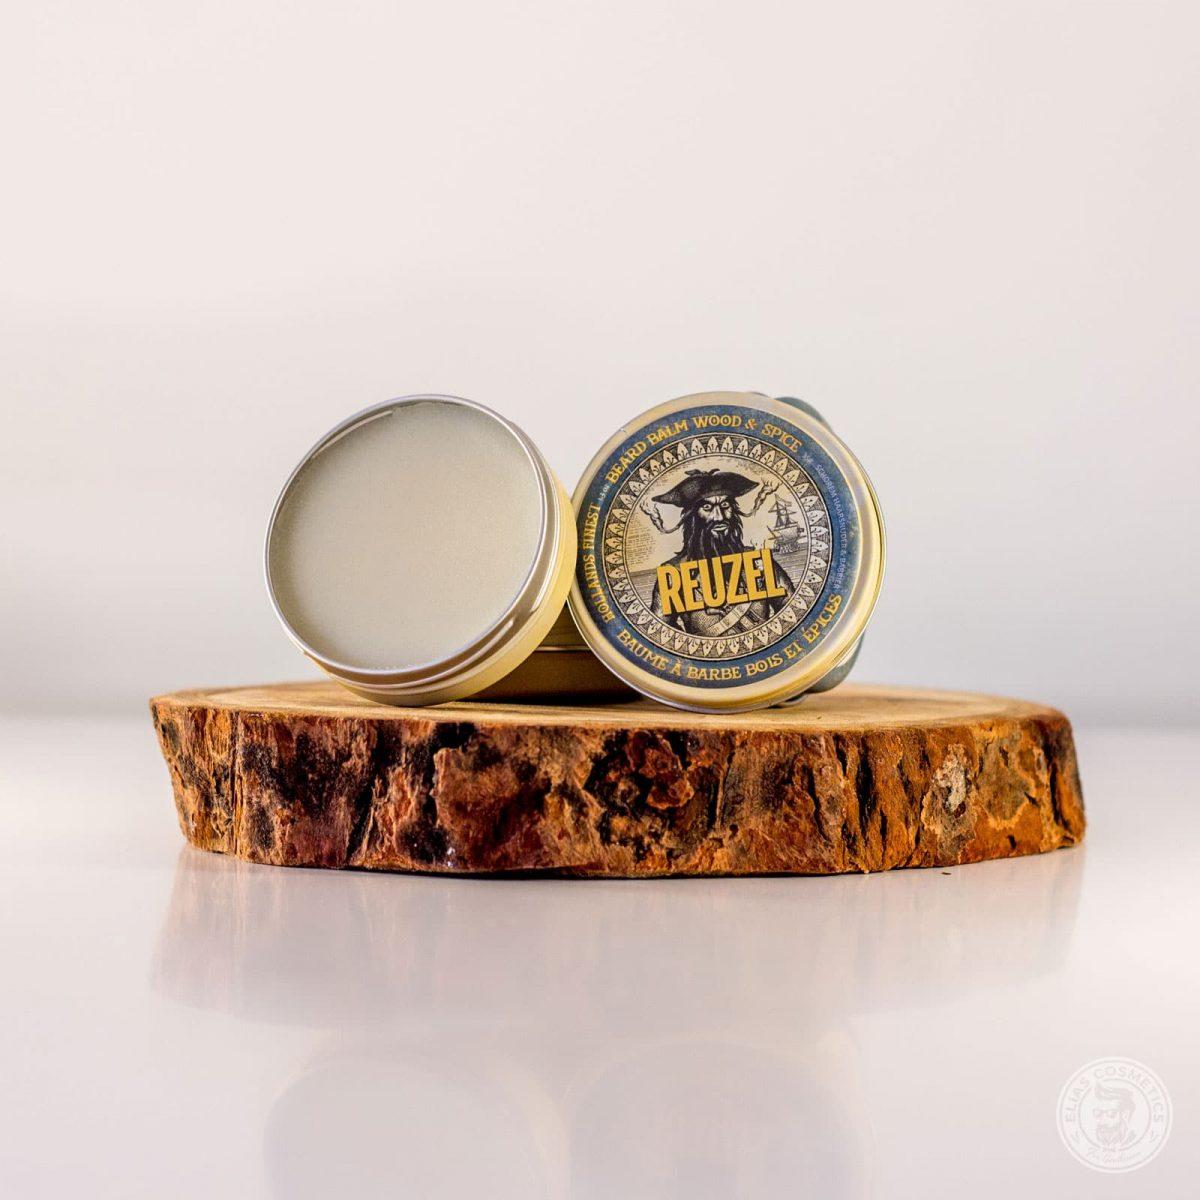 baume barbe Reuzel bois et épices boîte ouverte